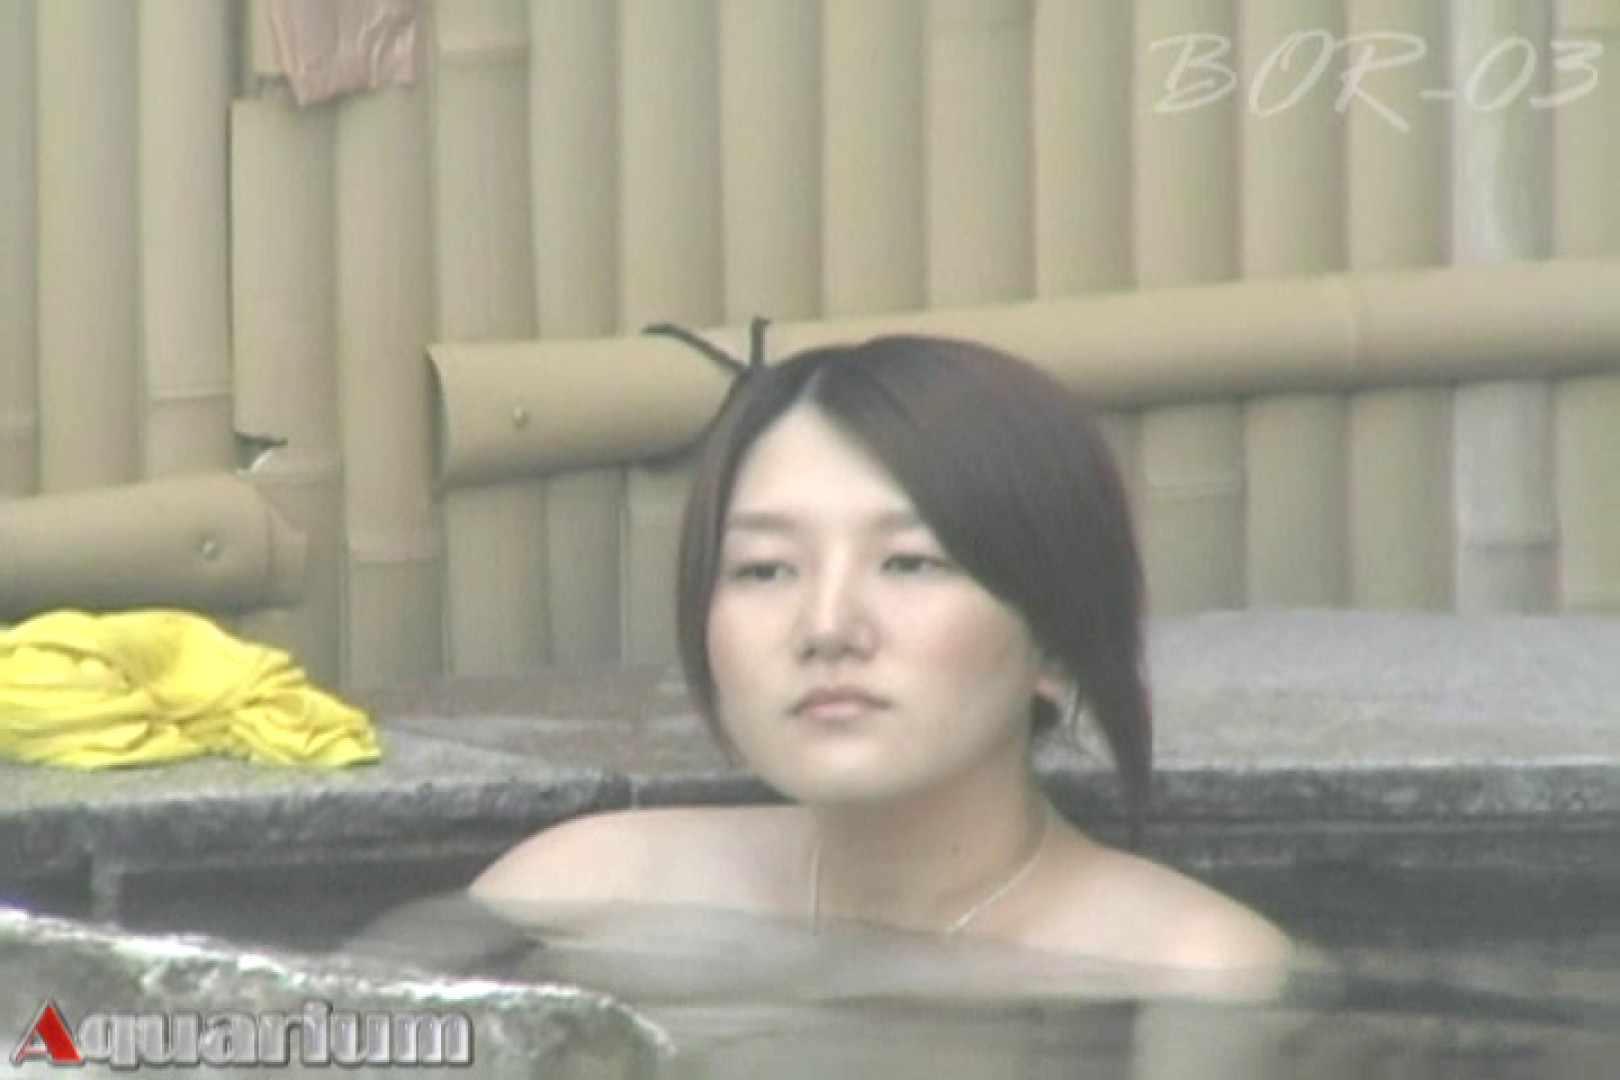 Aquaな露天風呂Vol.487 OLのエロ生活   露天風呂  95連発 67